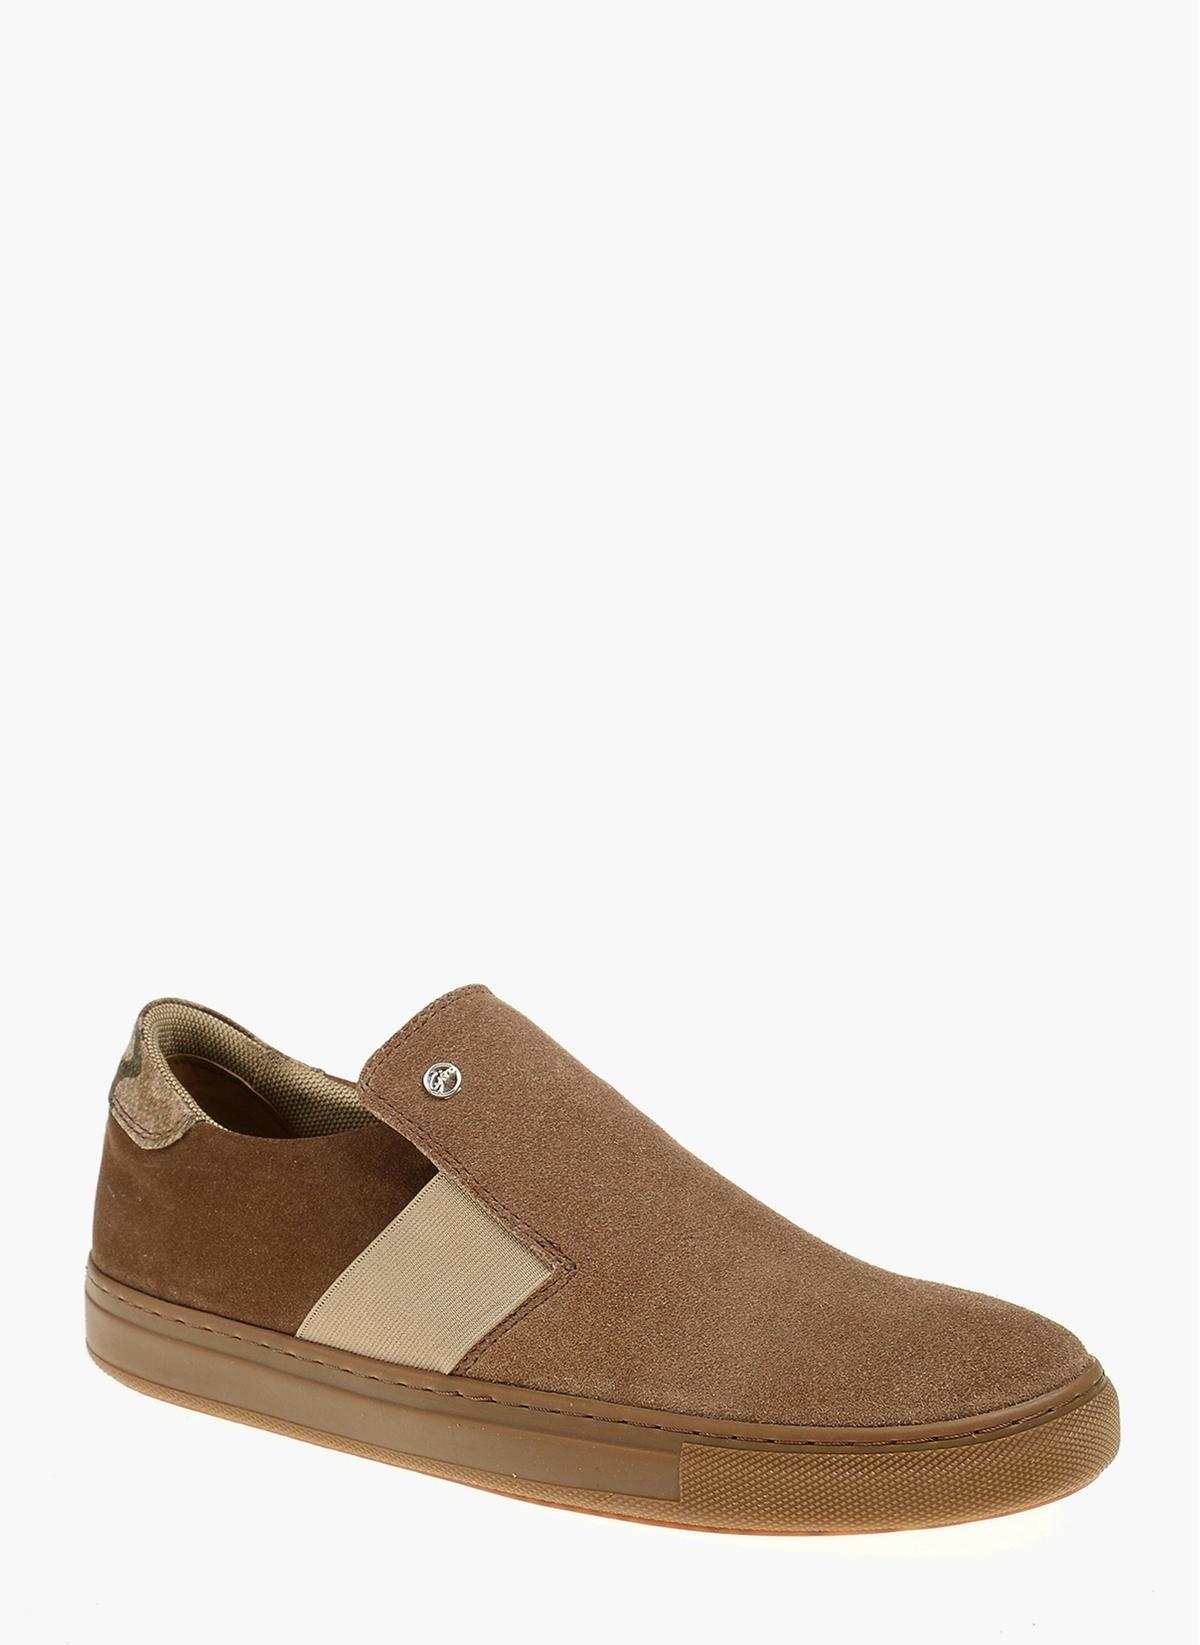 Divarese Lifestyle Ayakkabı 5021330 E Sneaker – 149.0 TL